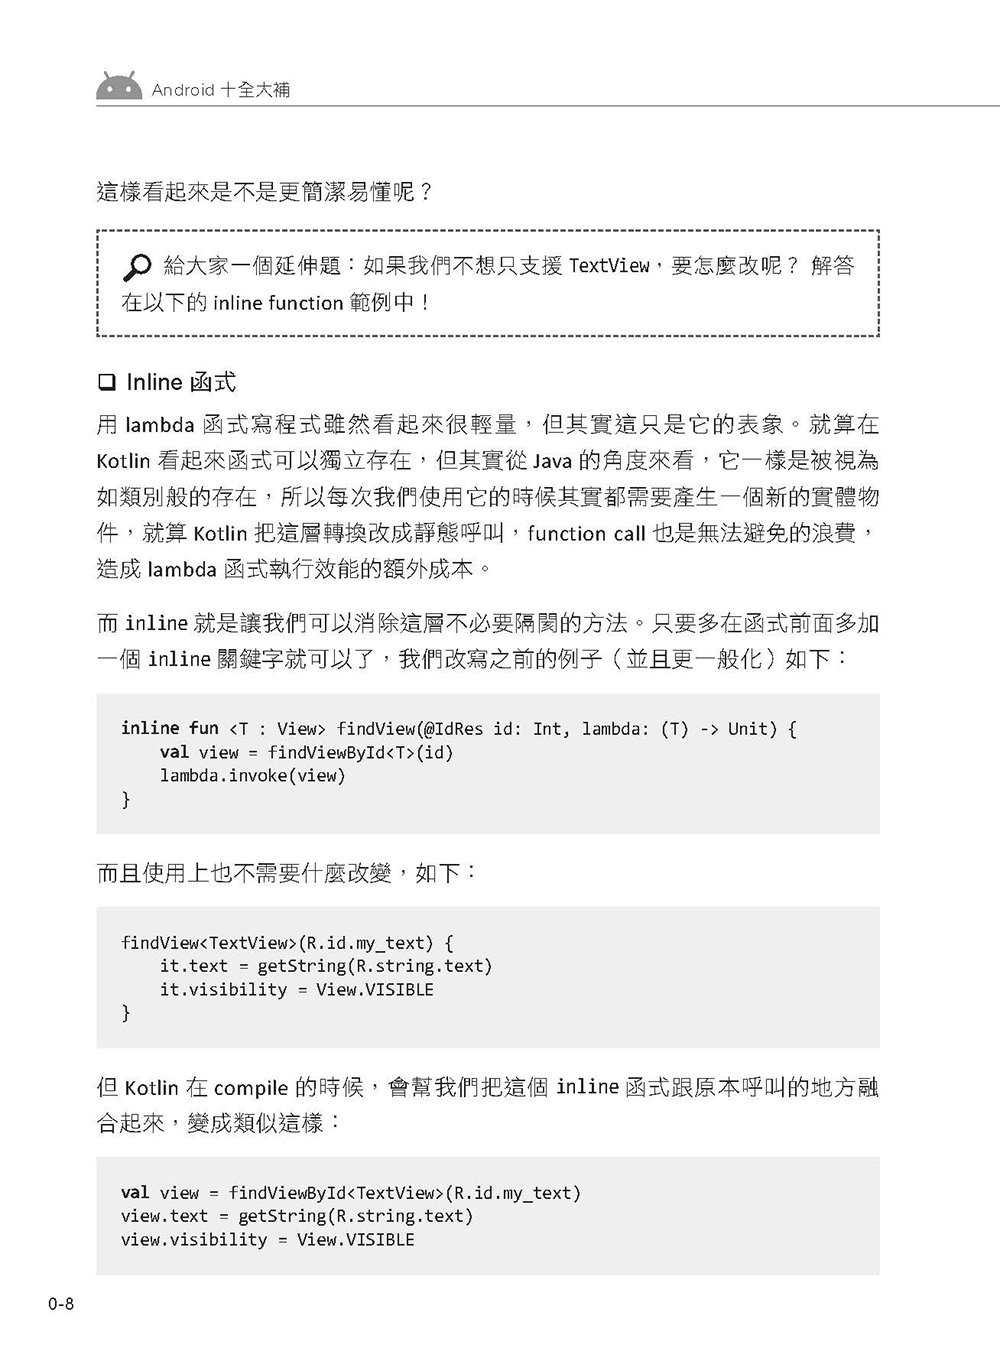 Android 十全大補:從 Kotlin、MVVM 到測試的全方面介紹(iT邦幫忙鐵人賽系列書)-preview-10